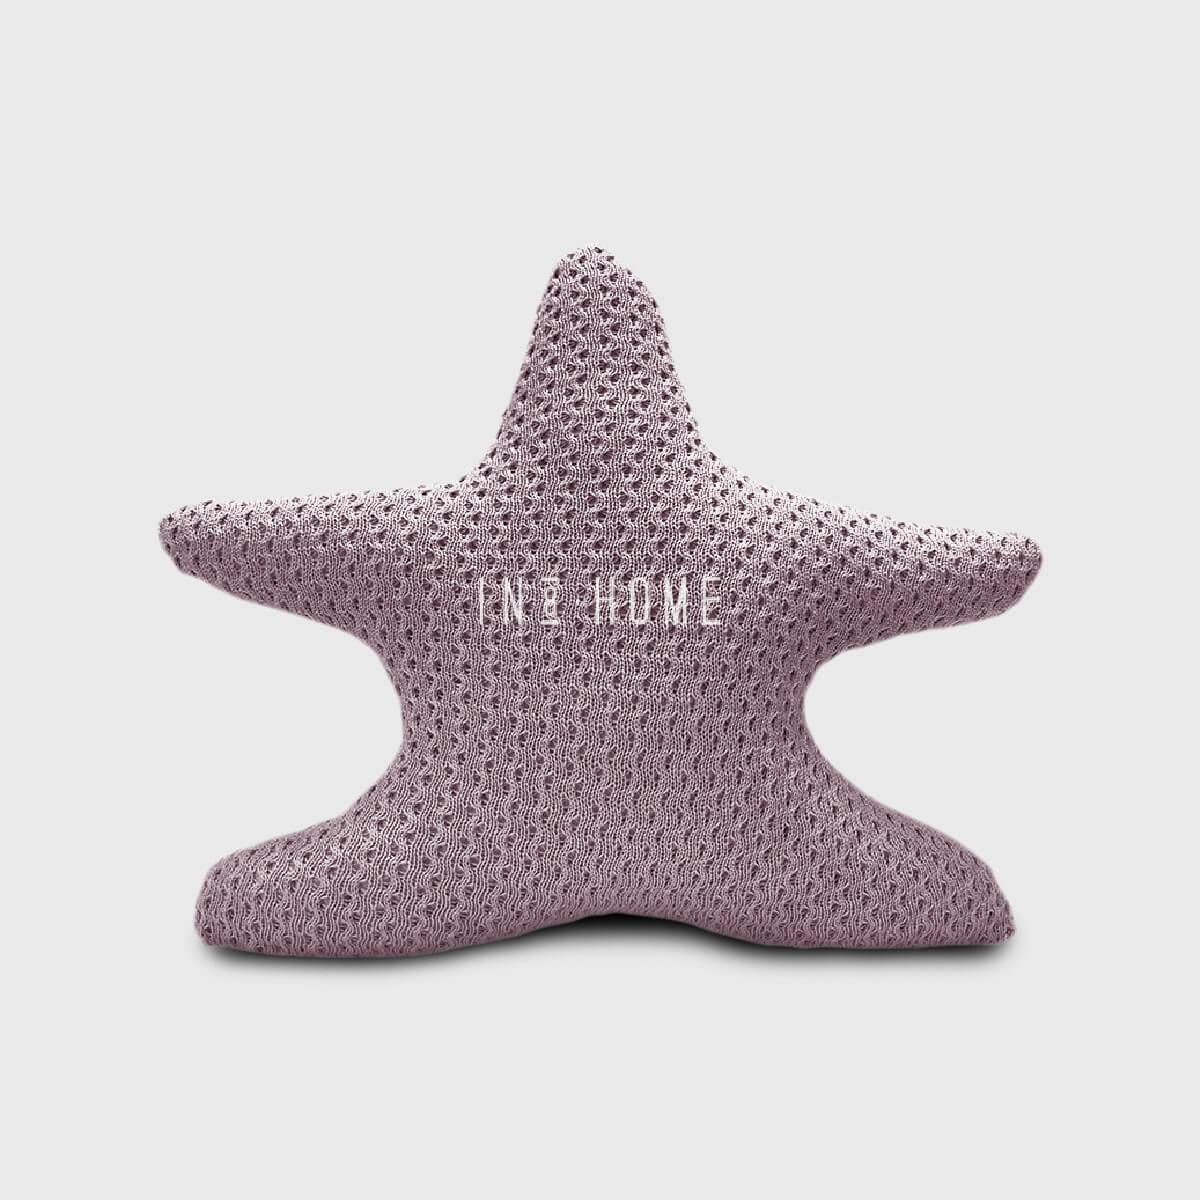 Almofada estrela | Rian Tricot